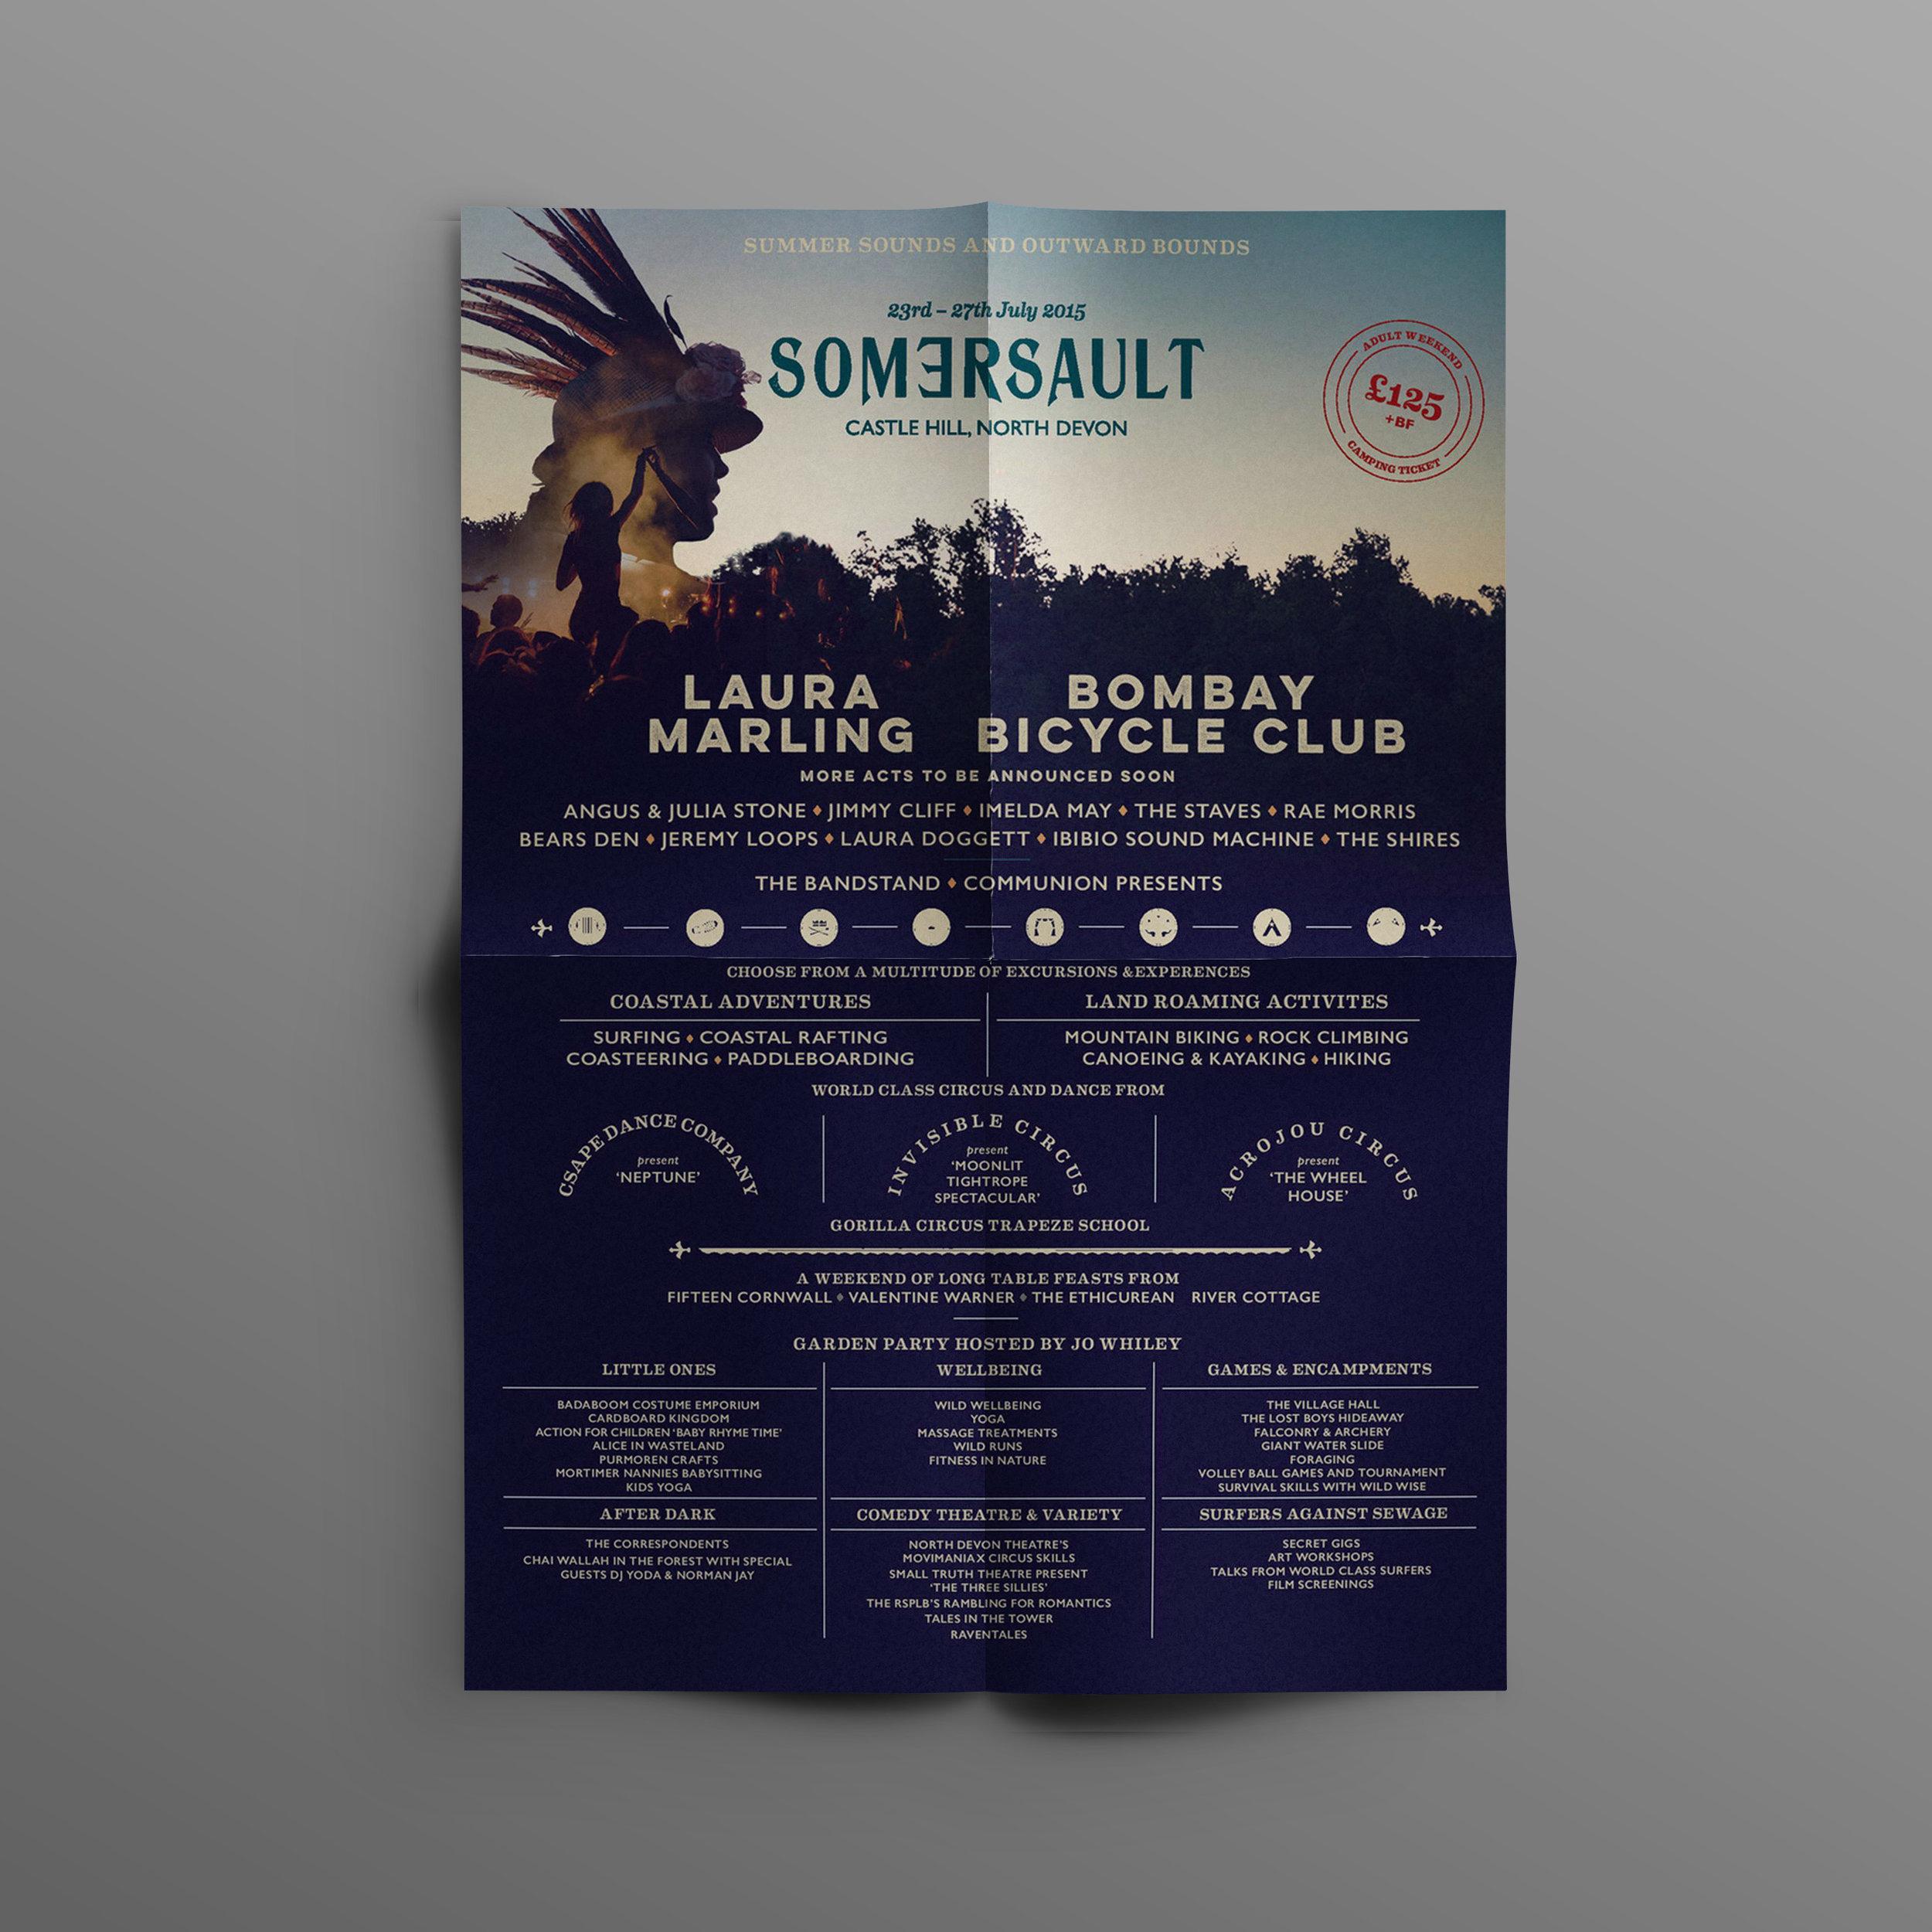 A4-paper-Overhead-view-mockup-vol-2.jpg